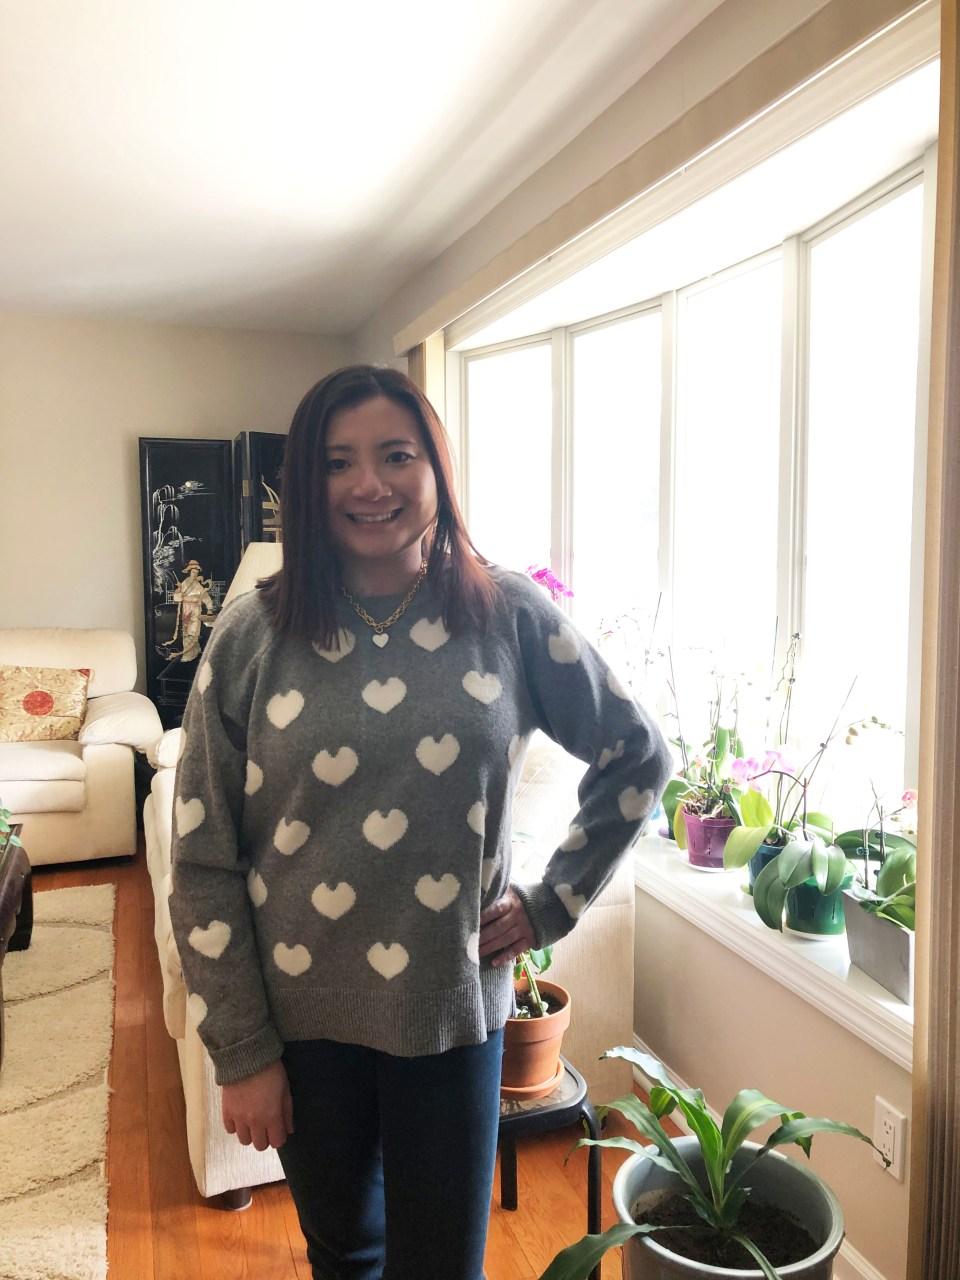 White Heart Sweater 10